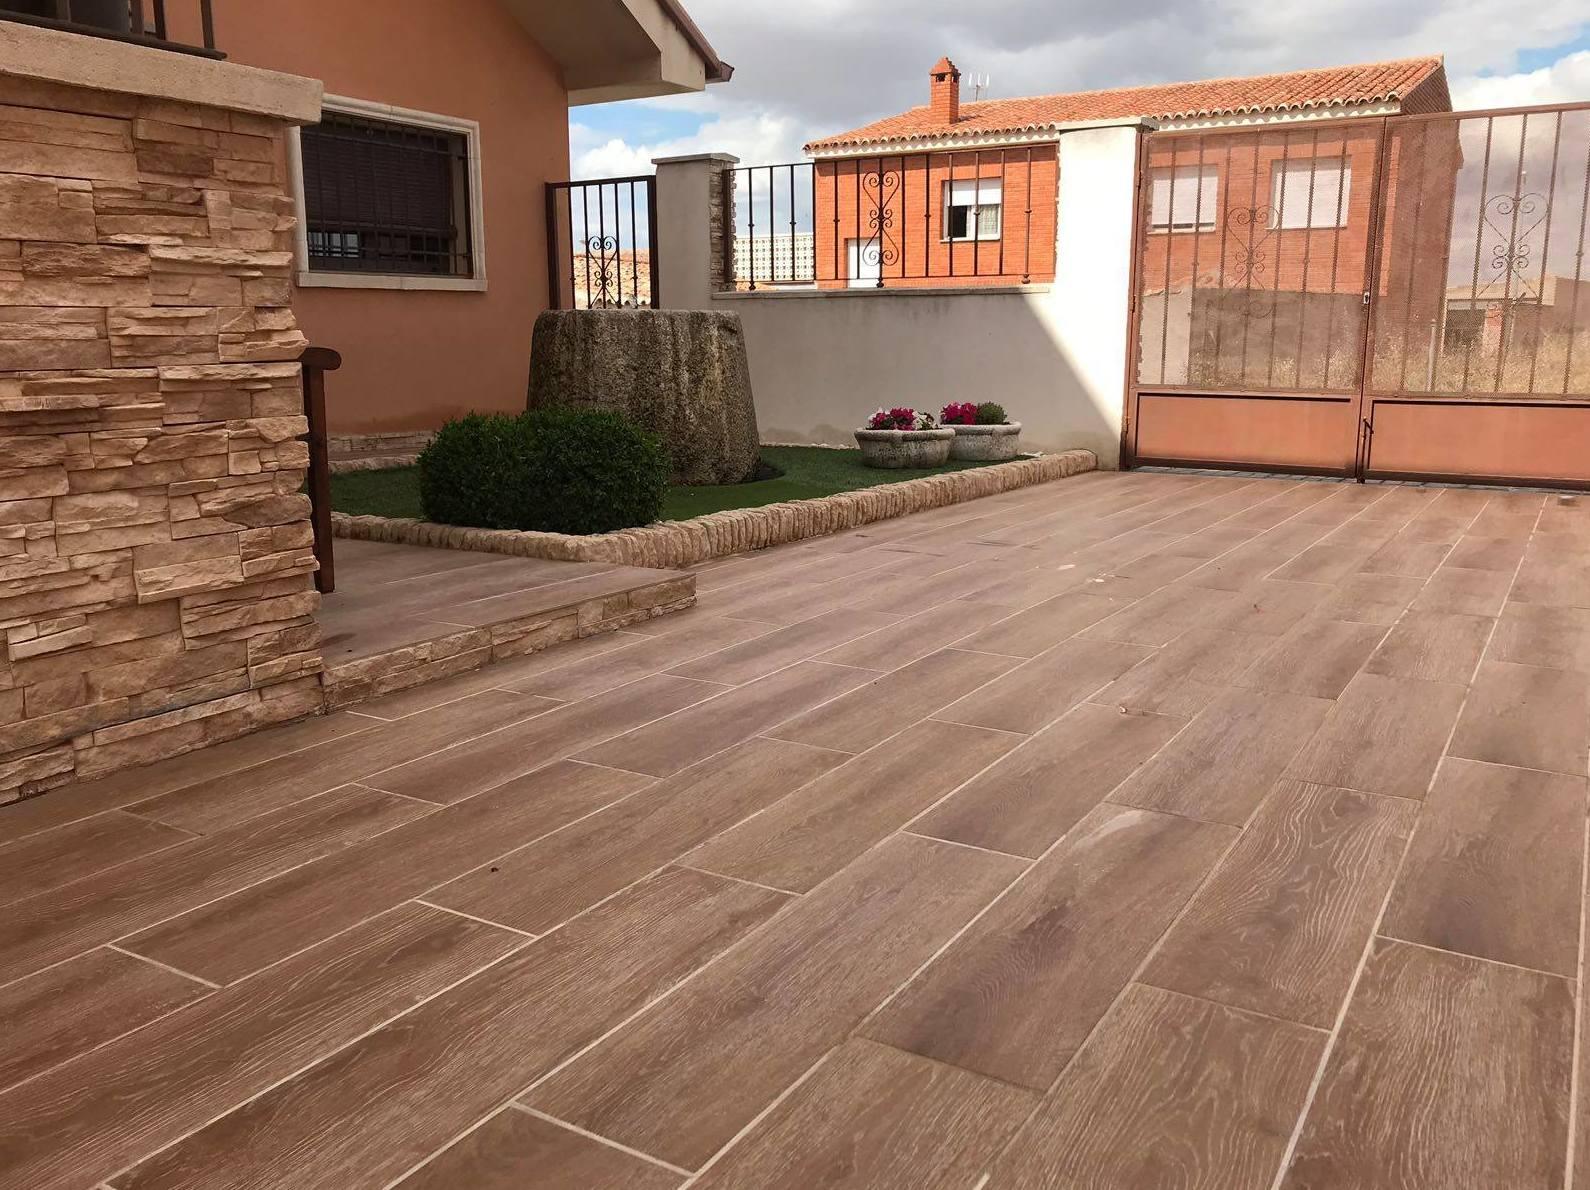 Suelos para exterior top suelos baratos para patios - Pavimento exterior barato ...